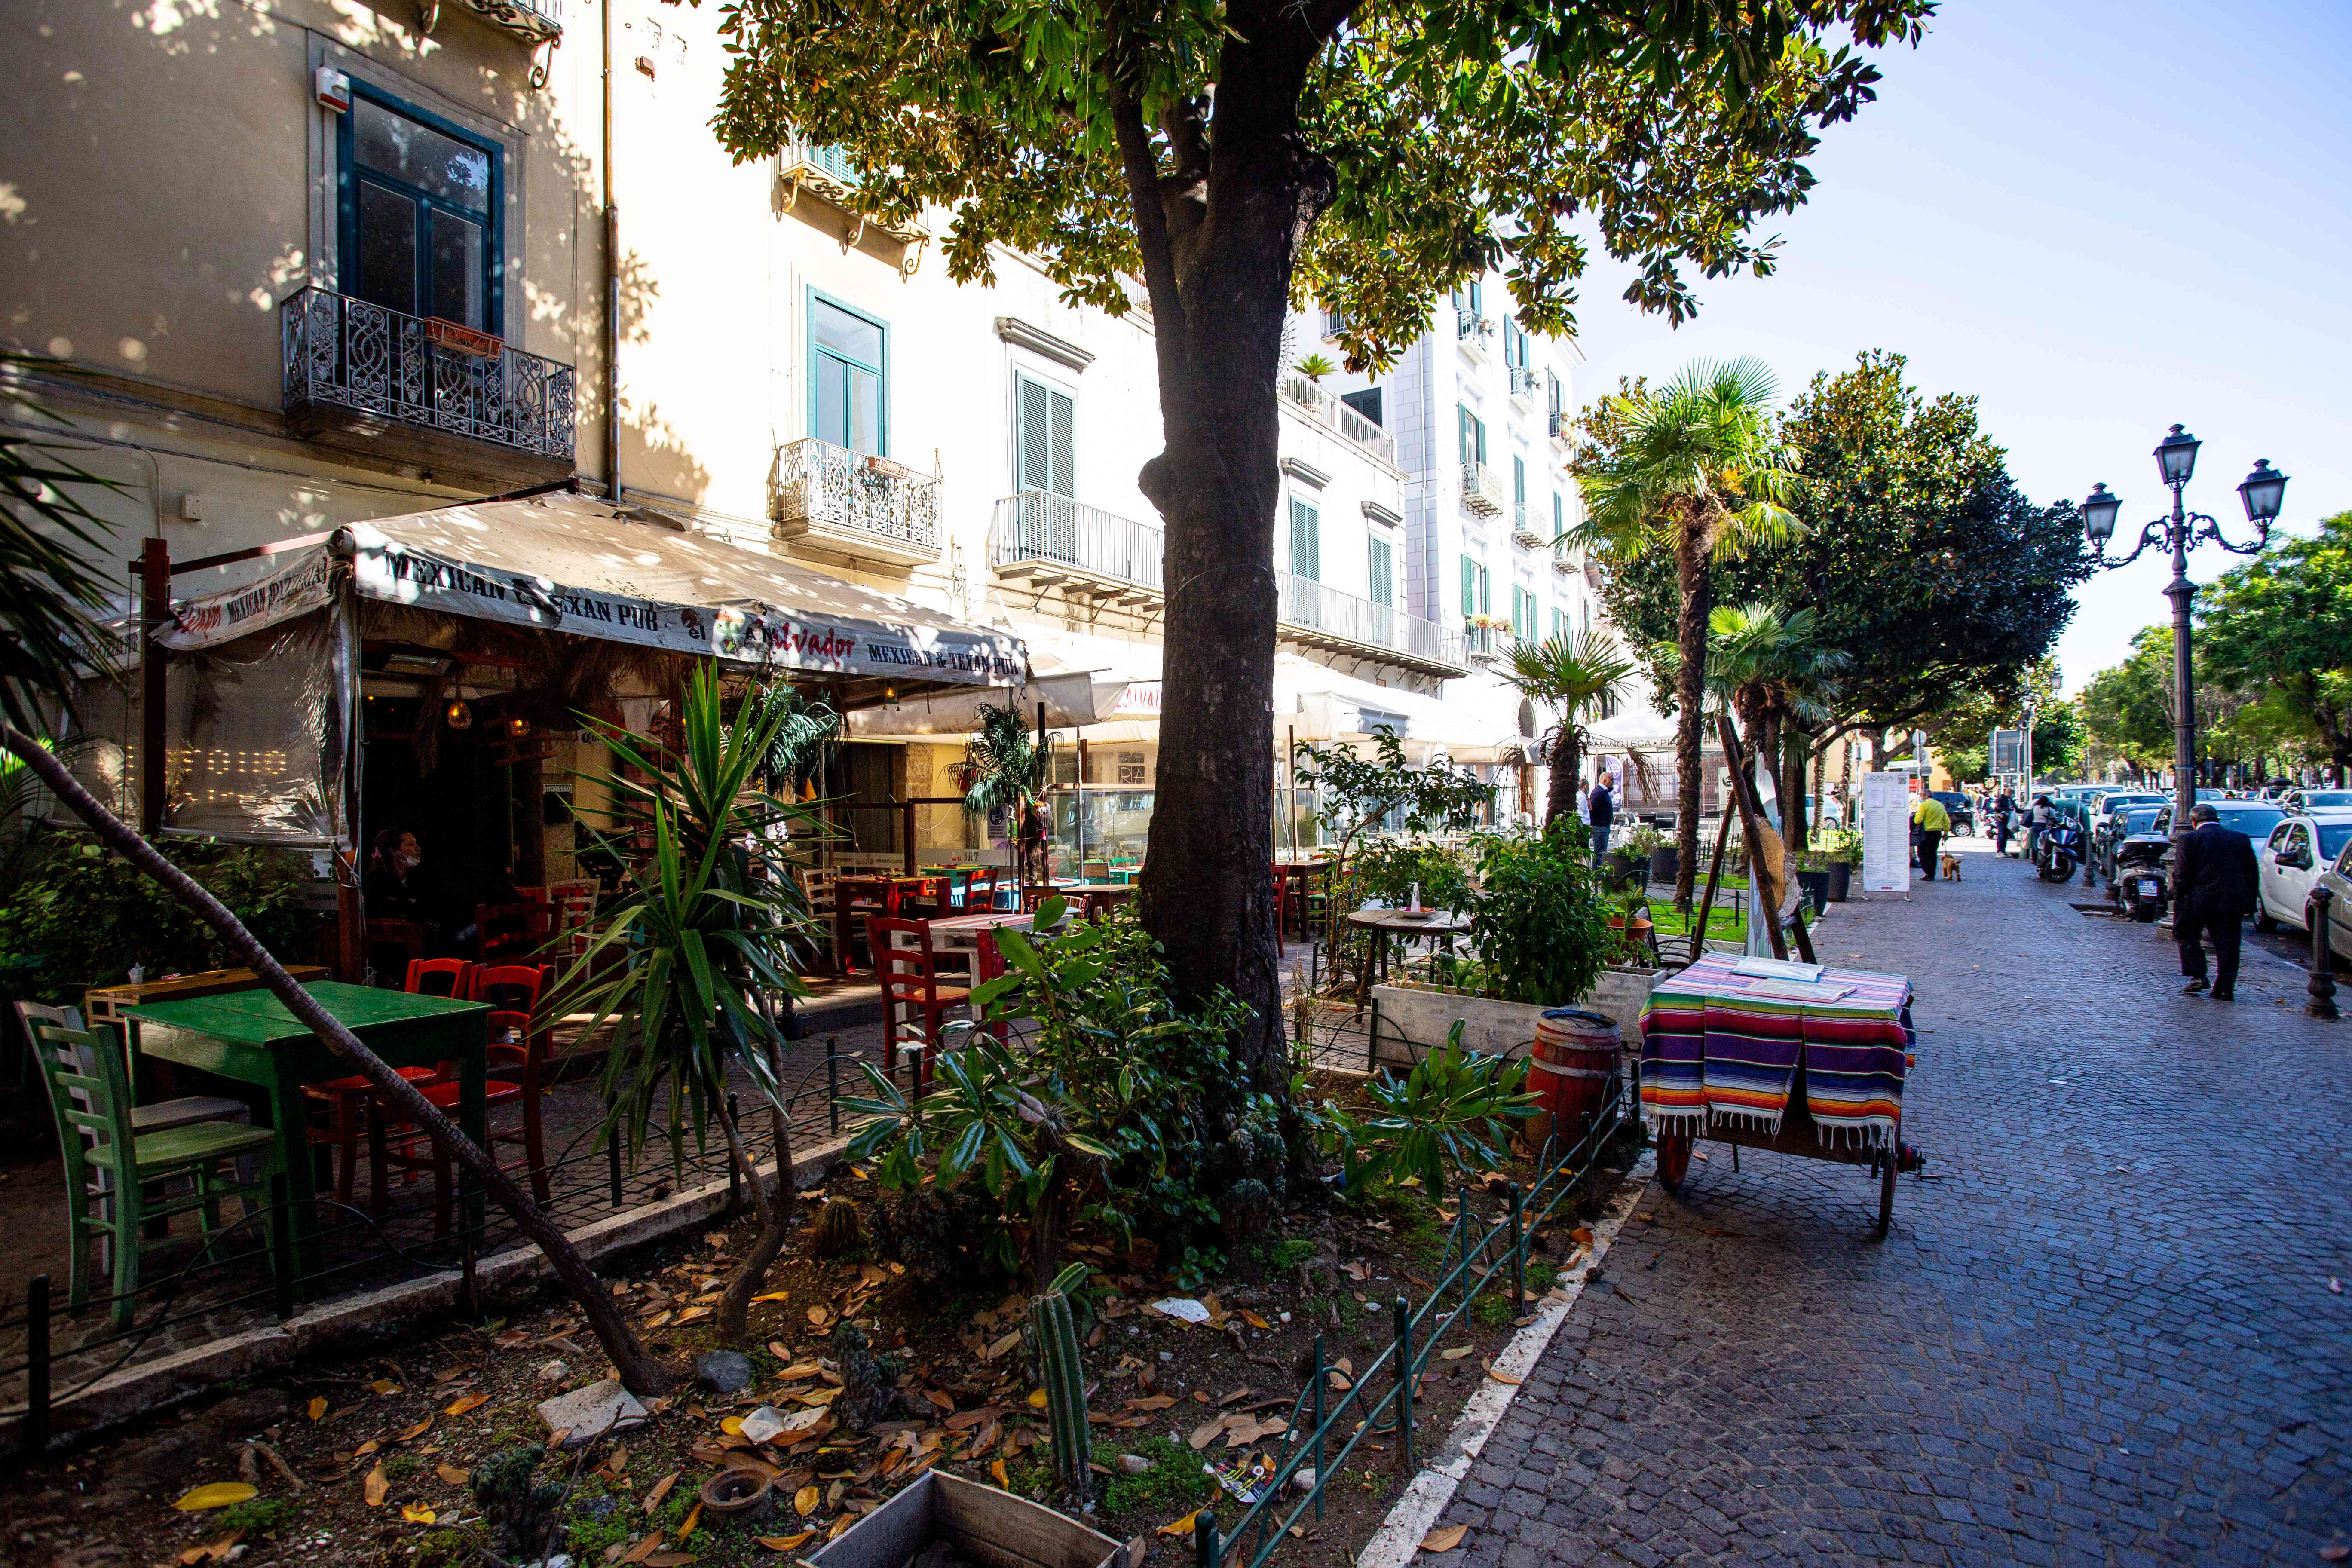 Promenade Trieste in Salerno